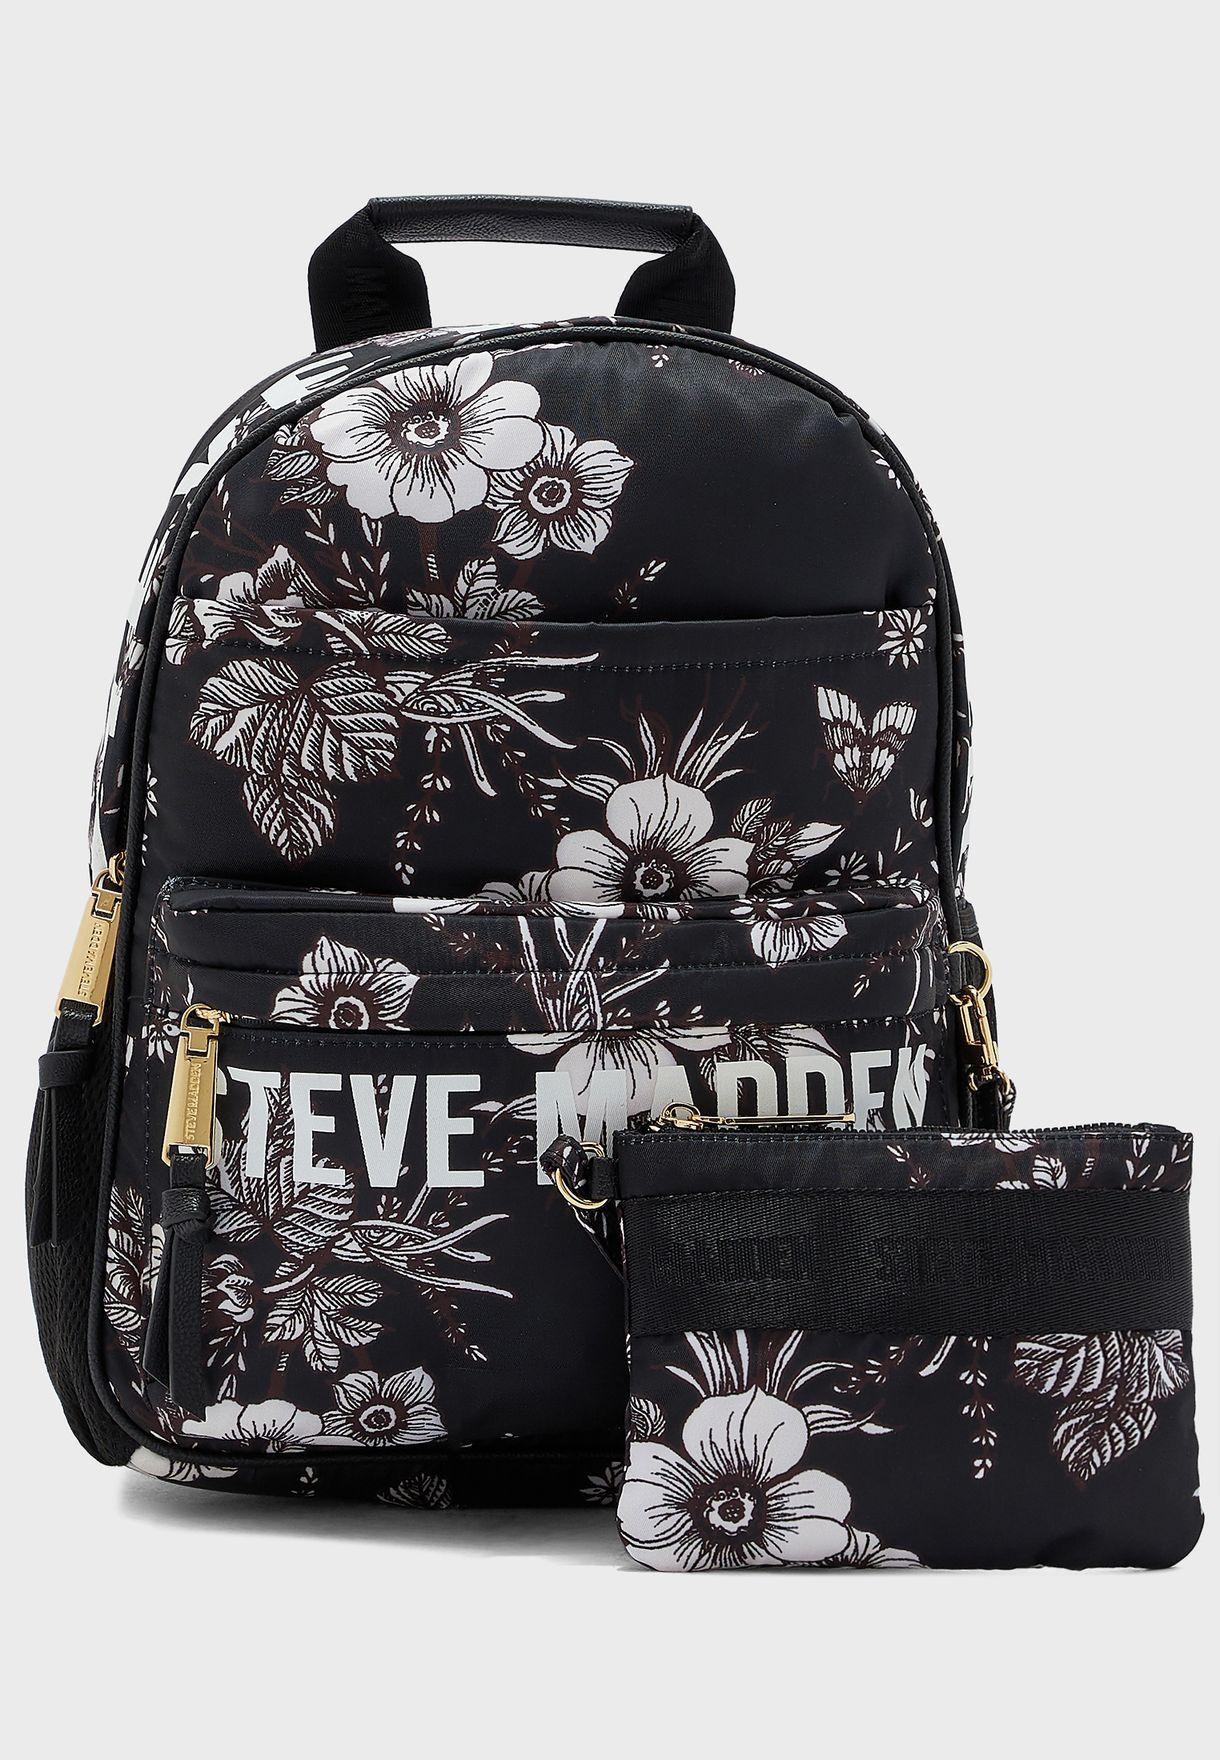 Bforce Backpacks